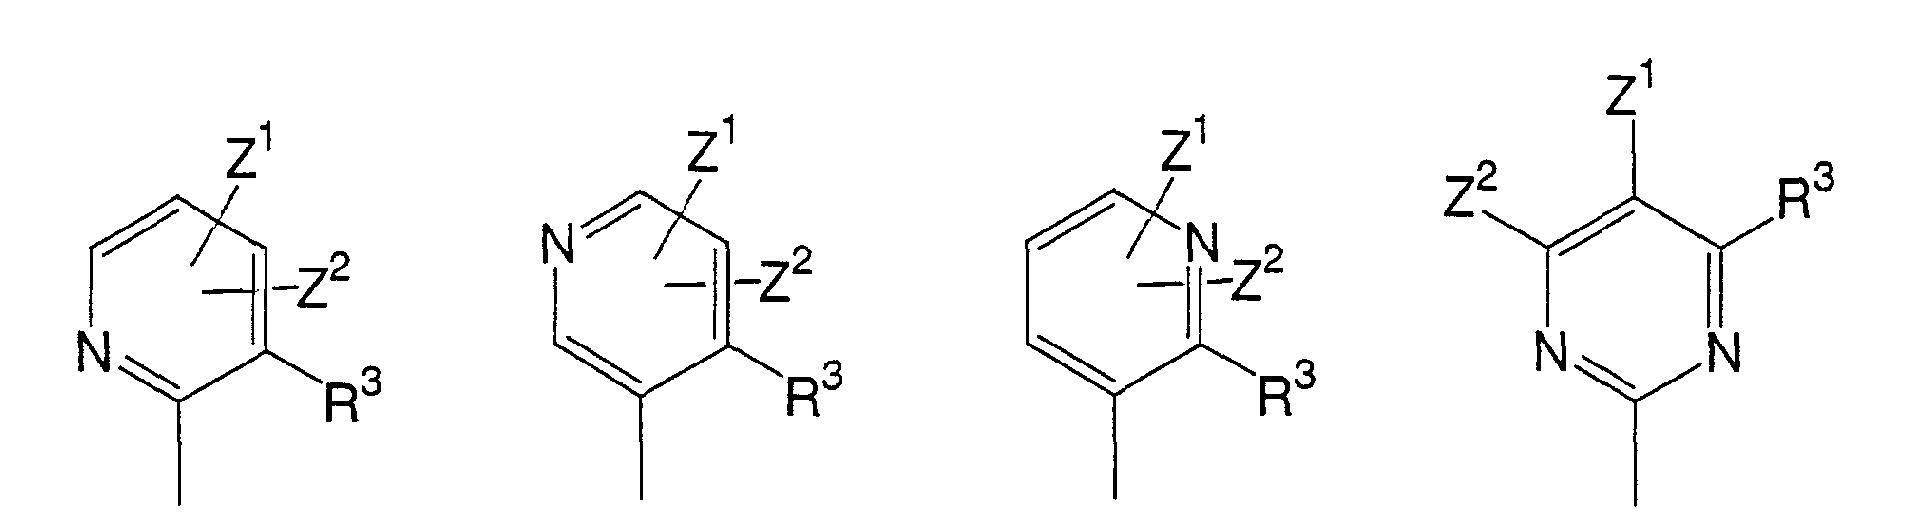 Figure 02520001